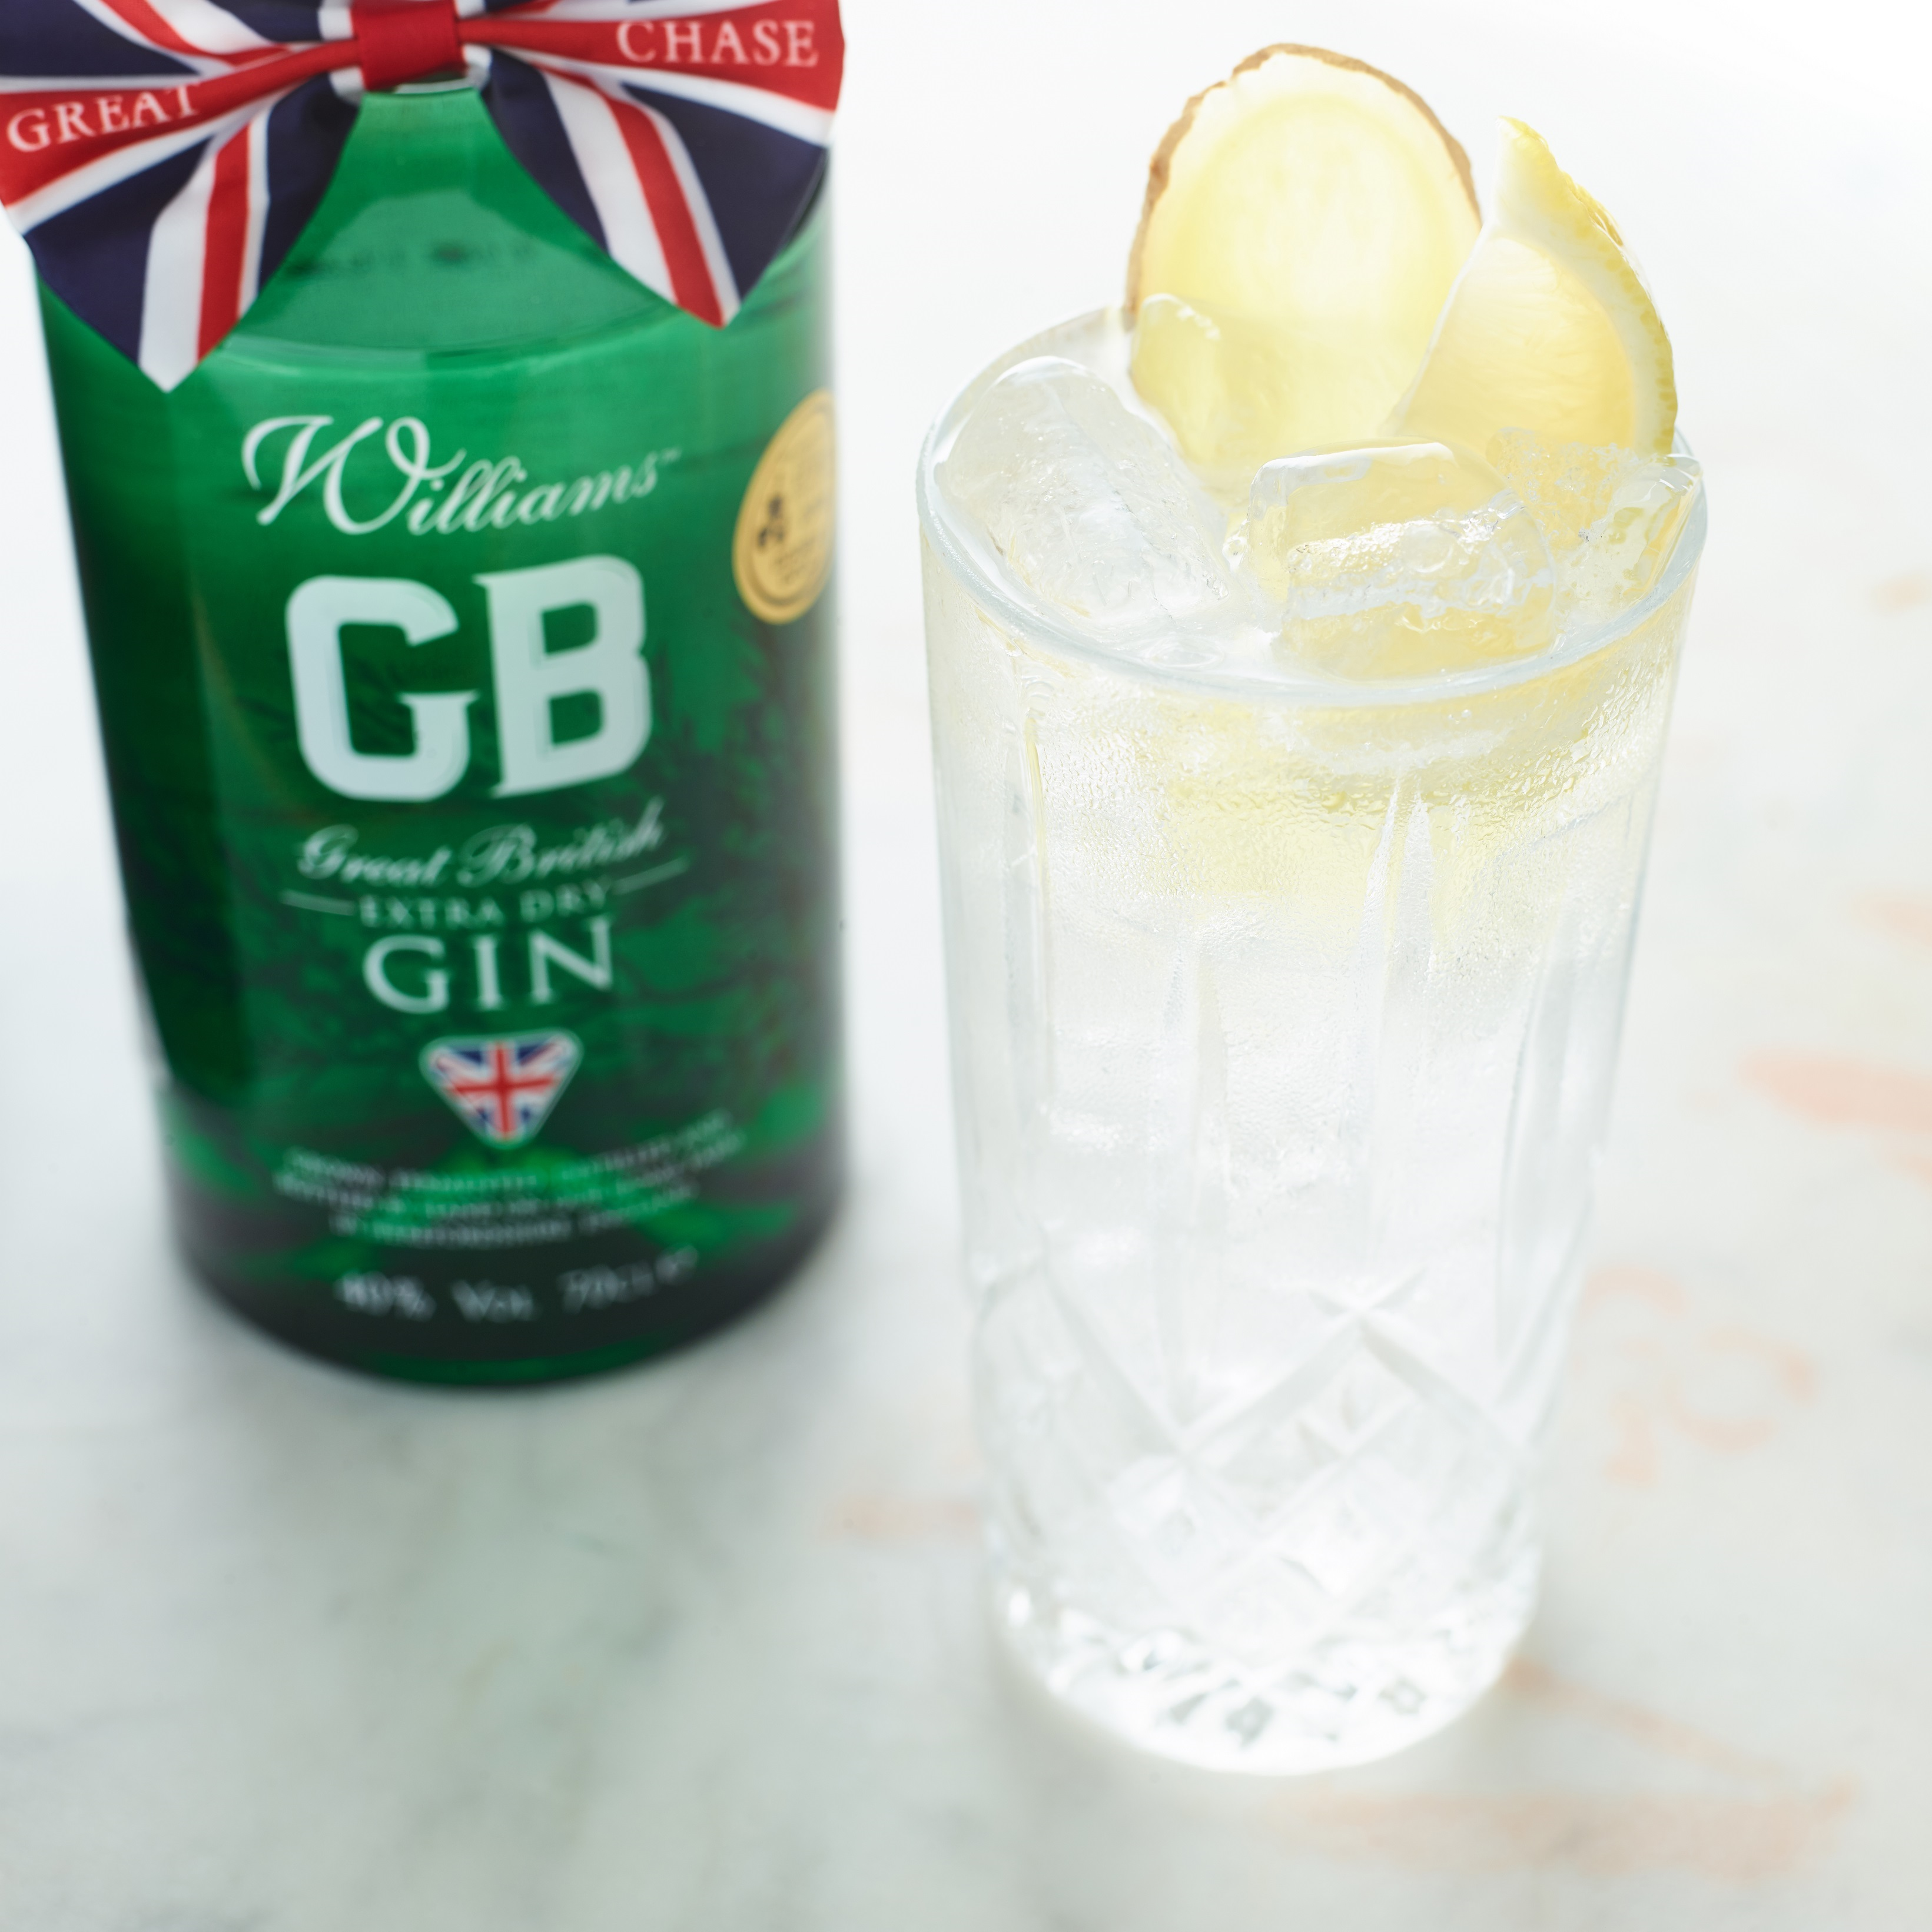 chase gin 4 [1434756]